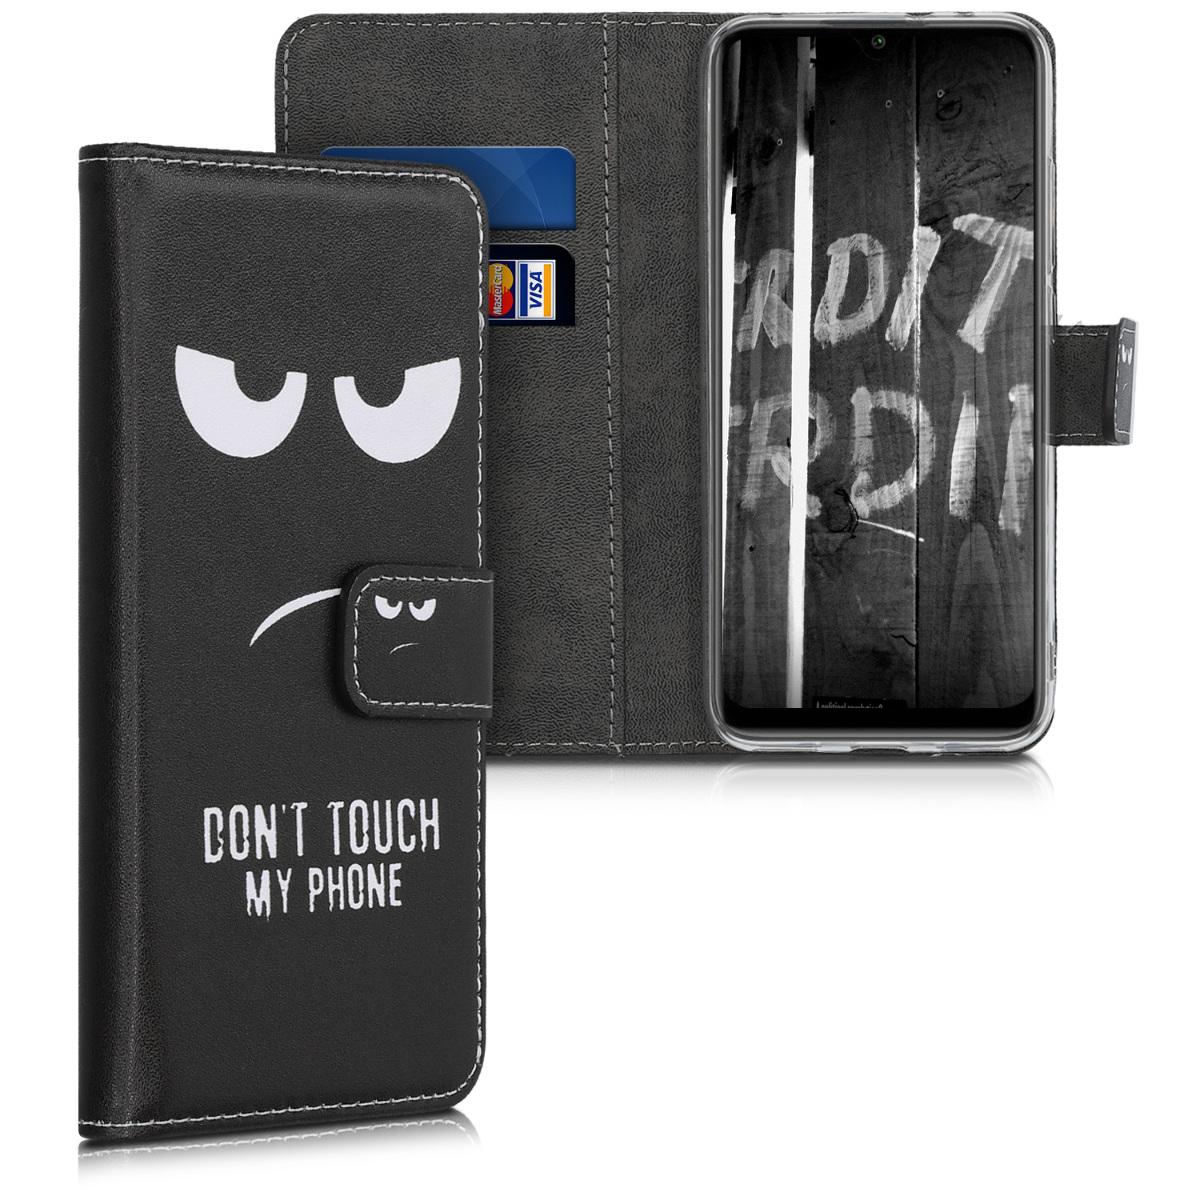 KW Θήκη - Πορτοφόλι Xiaomi Mi A3 - PU Leather Protective Flip Cover - White / Black (50049.01)